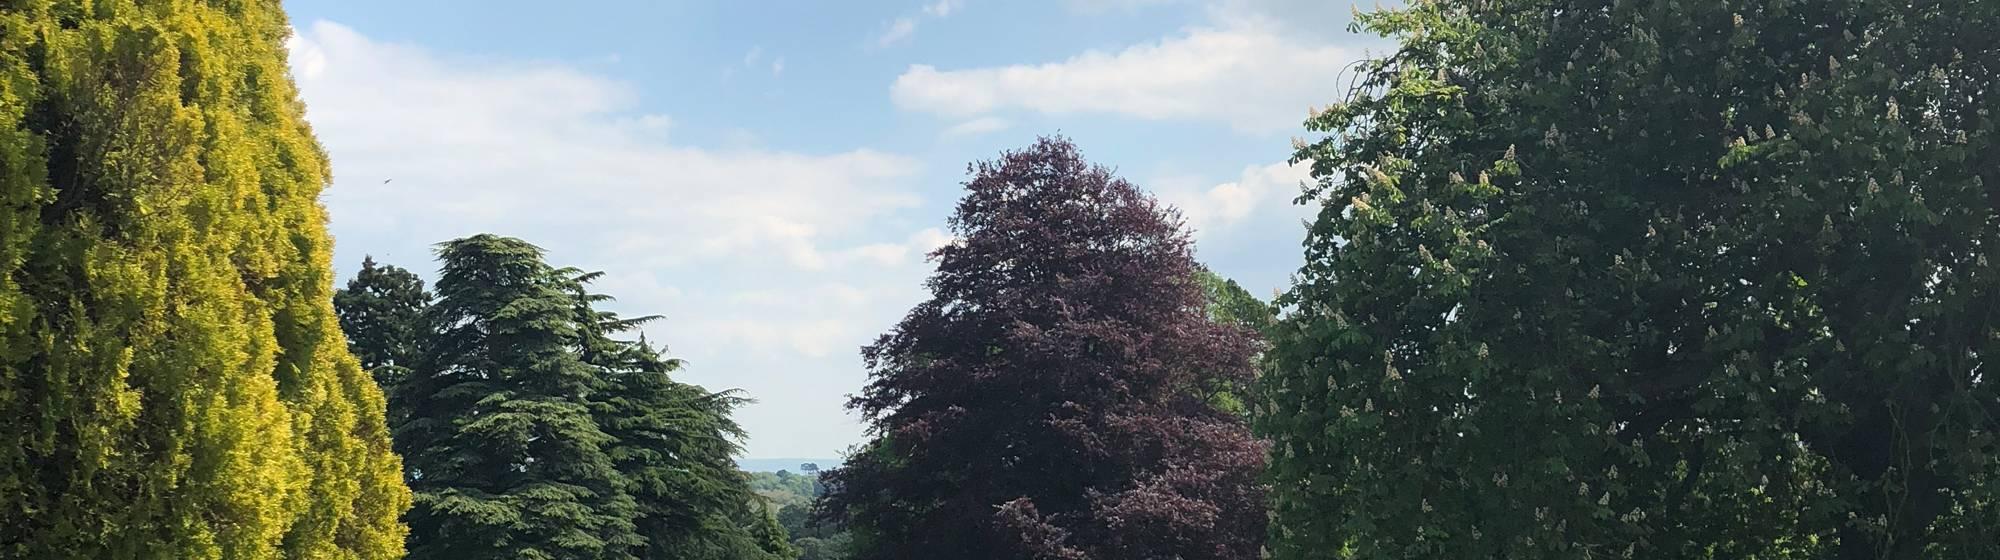 Gardens at Waddesdon